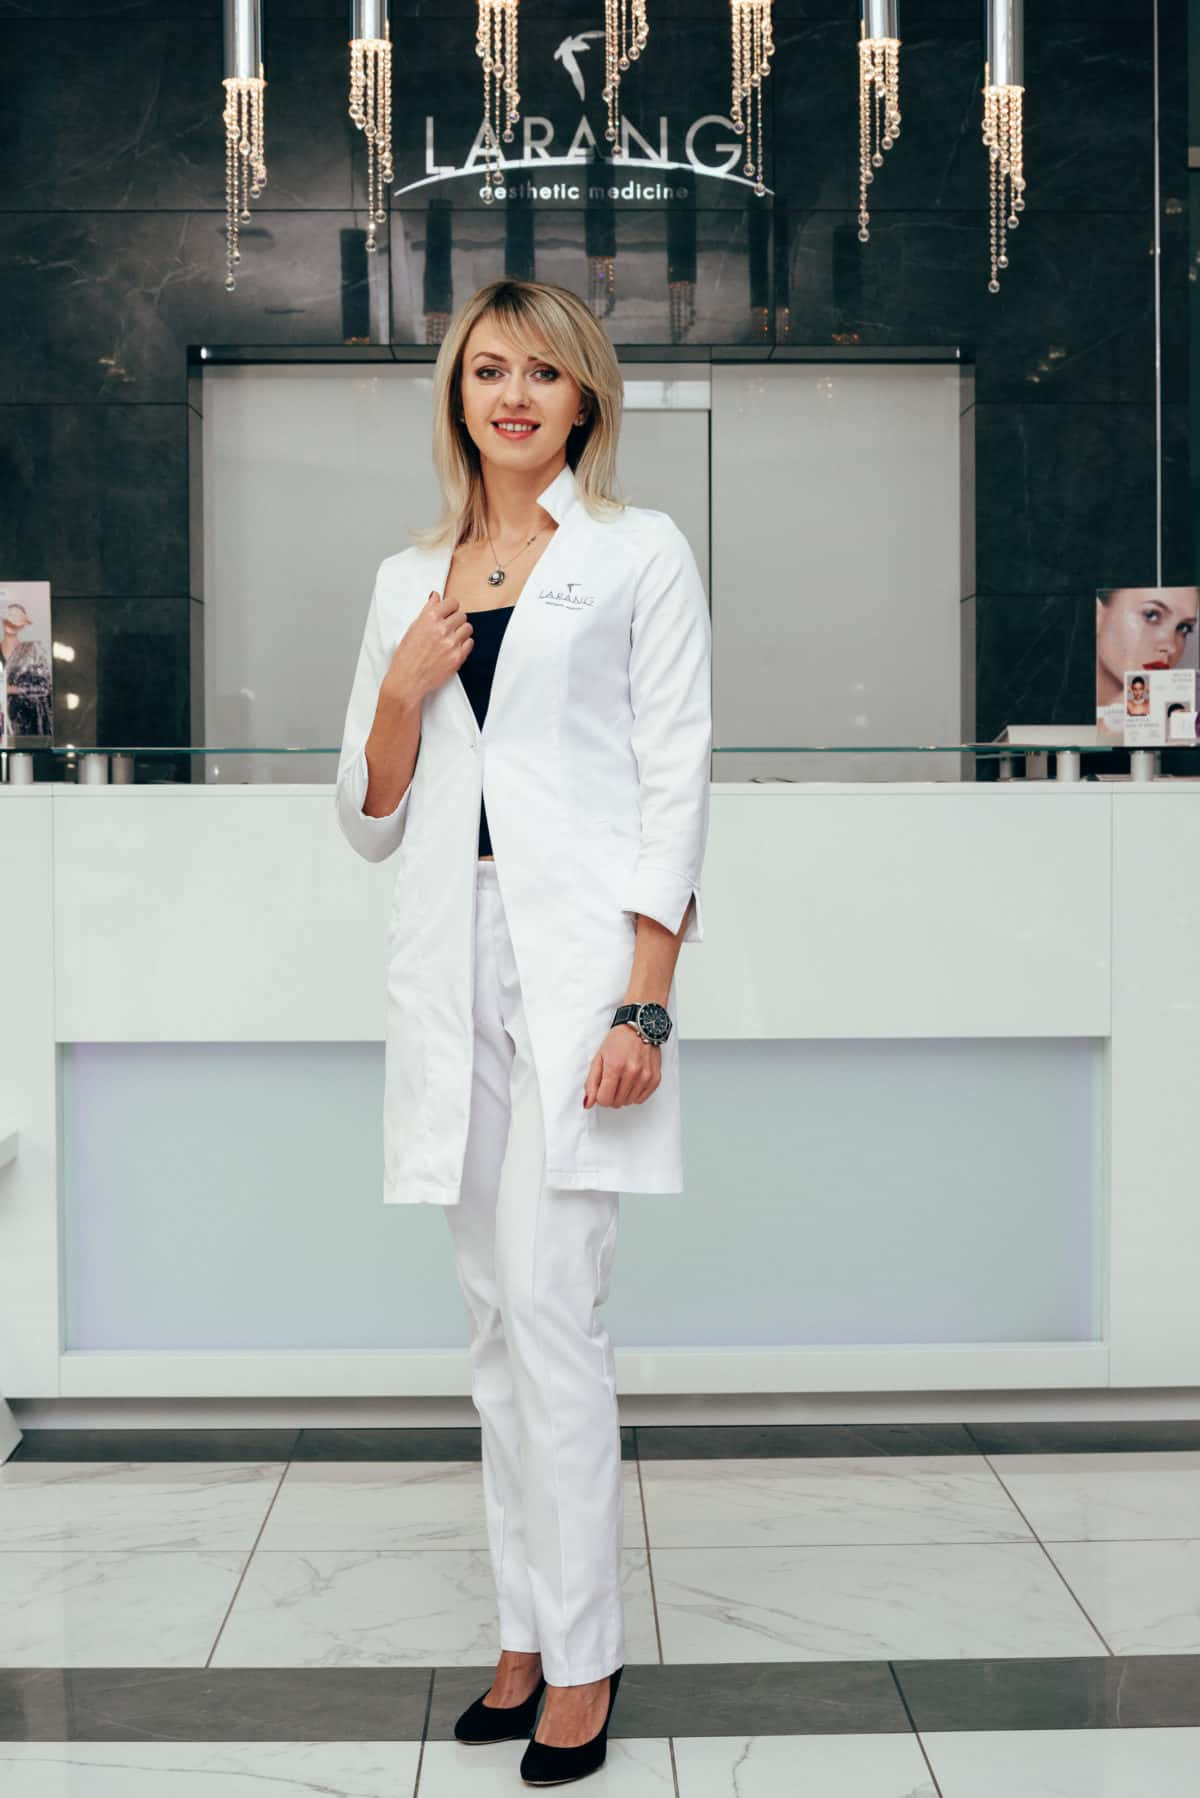 Косметолог-эстетист, специалист по лазерной дерматологии